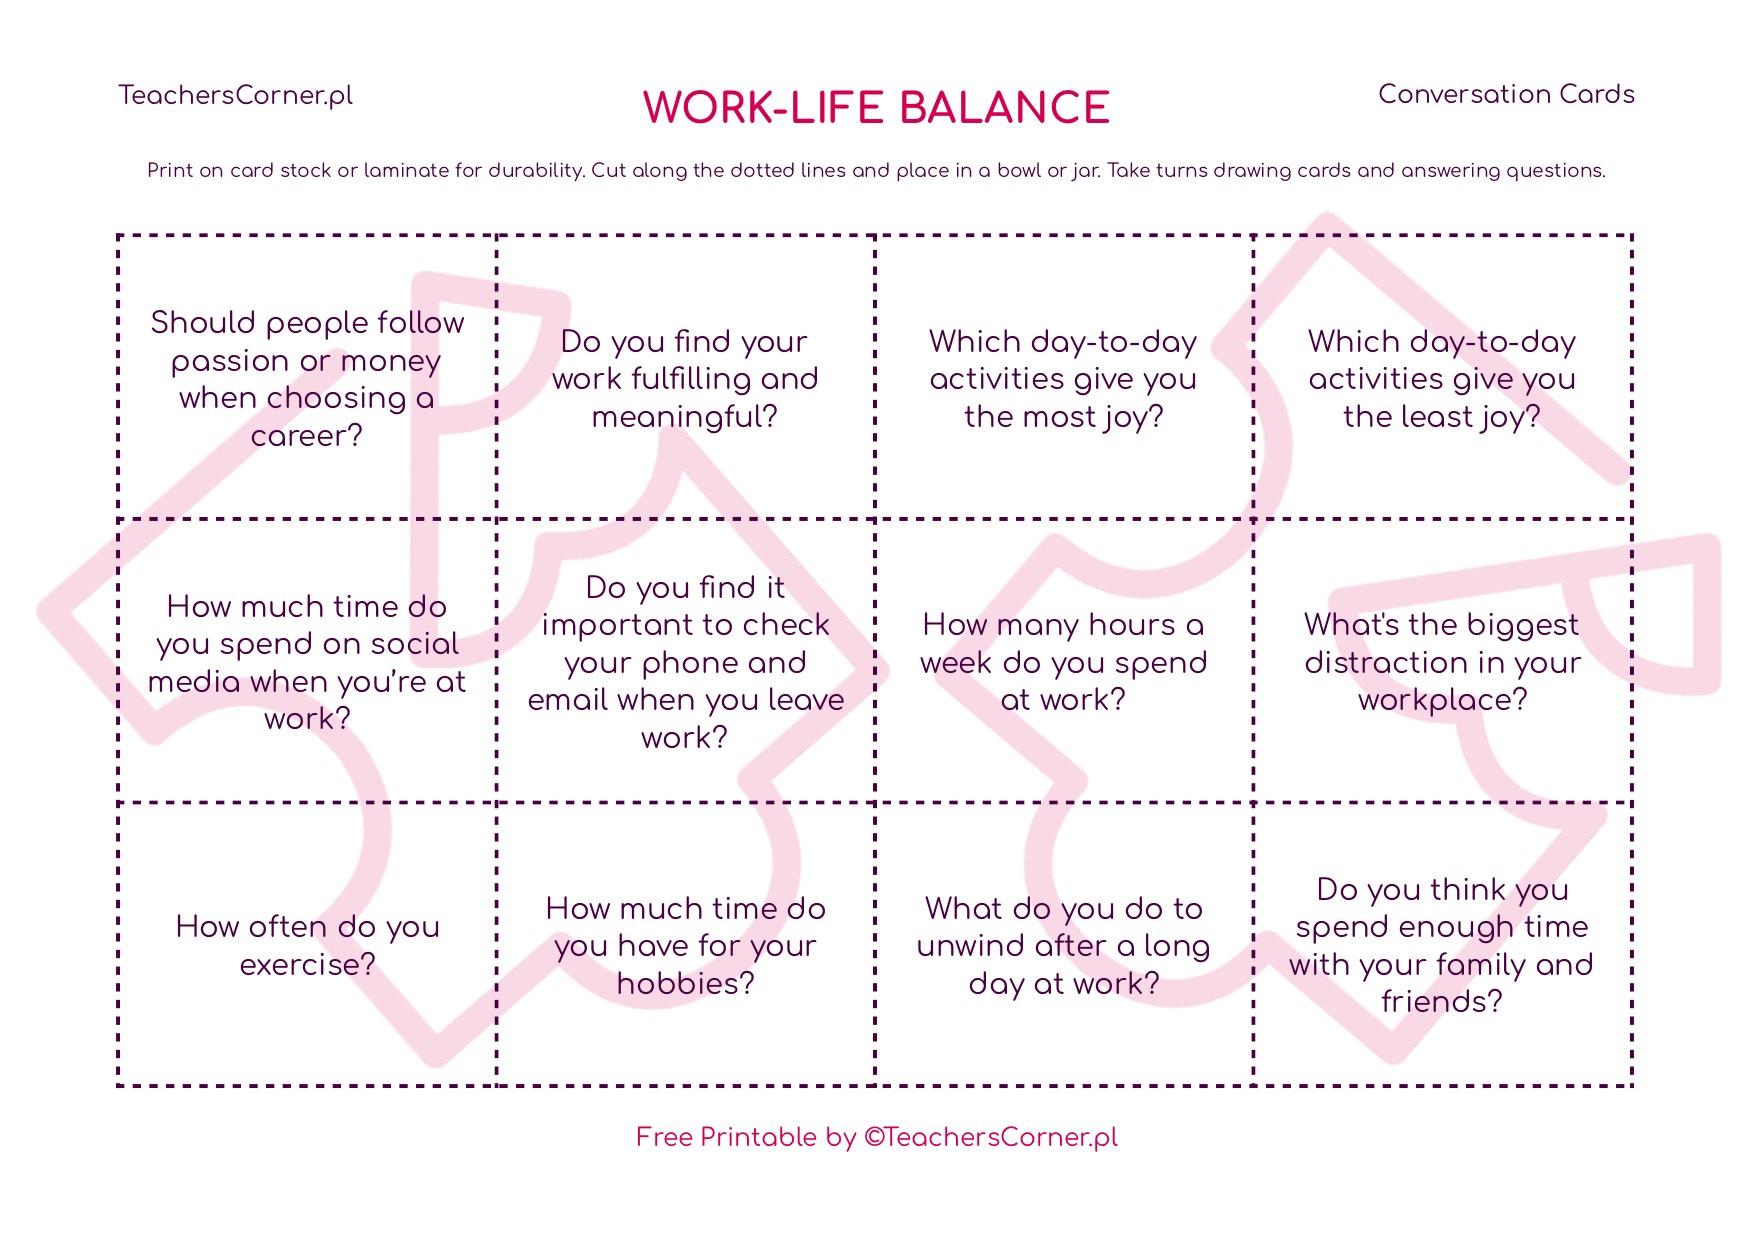 work-life balance conversation cards